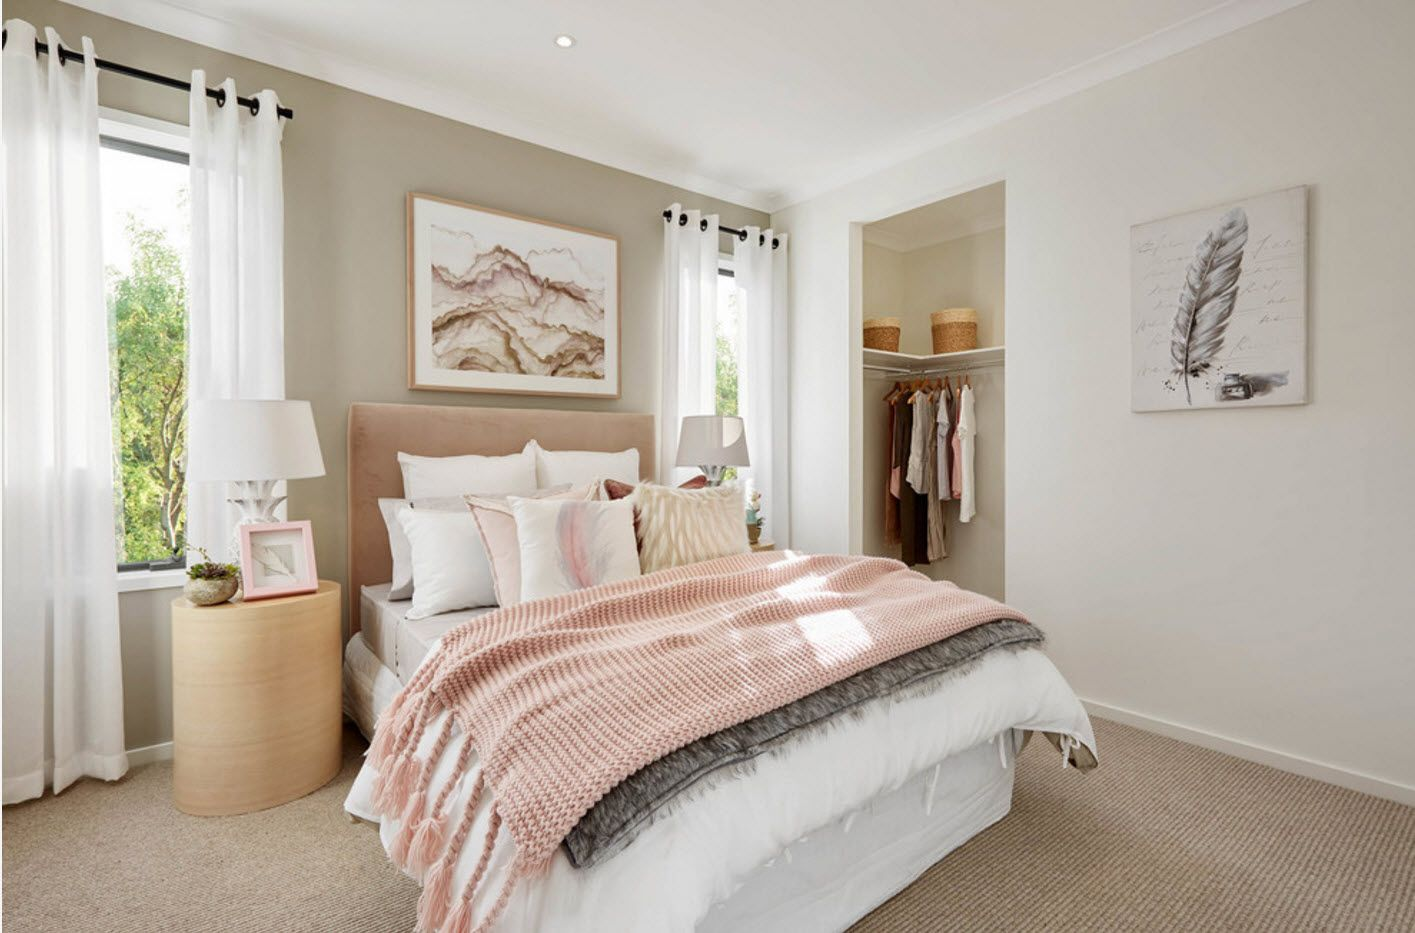 Modern Bedroom Interior Decoration & Design Ideas 2017. Pastel tones for tender atmosphere